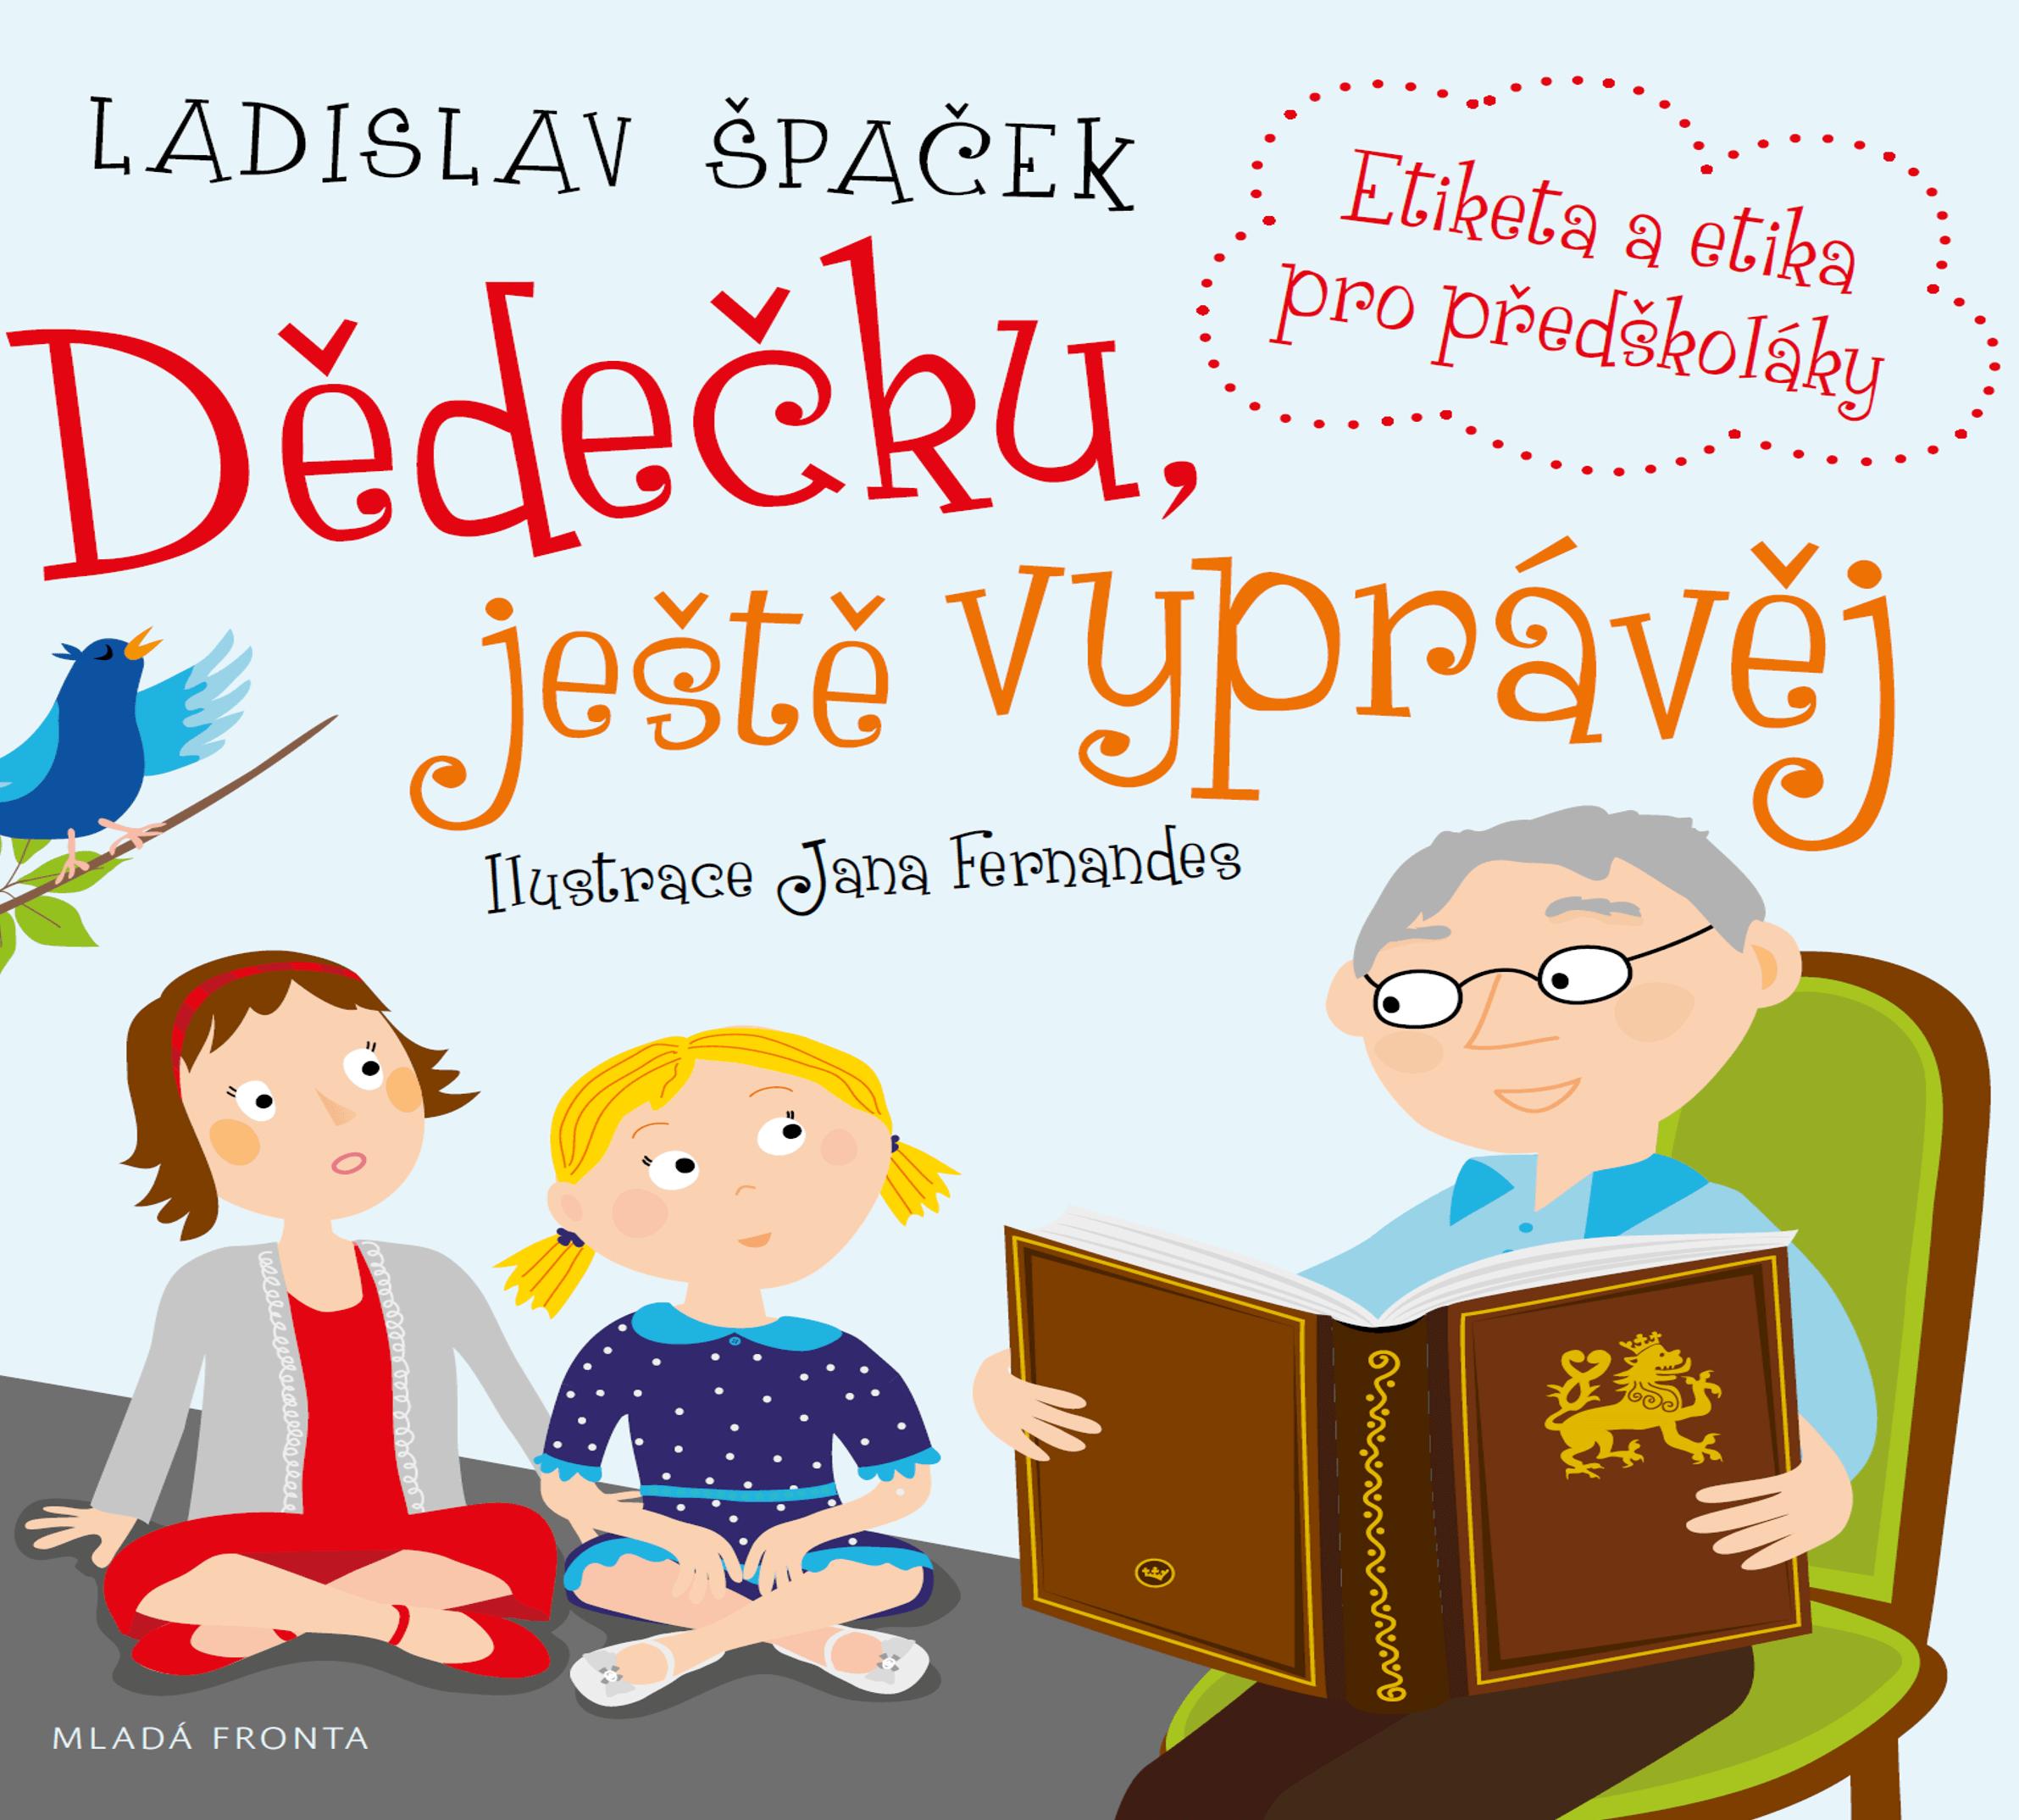 Ladislav Špaček c50bf20997